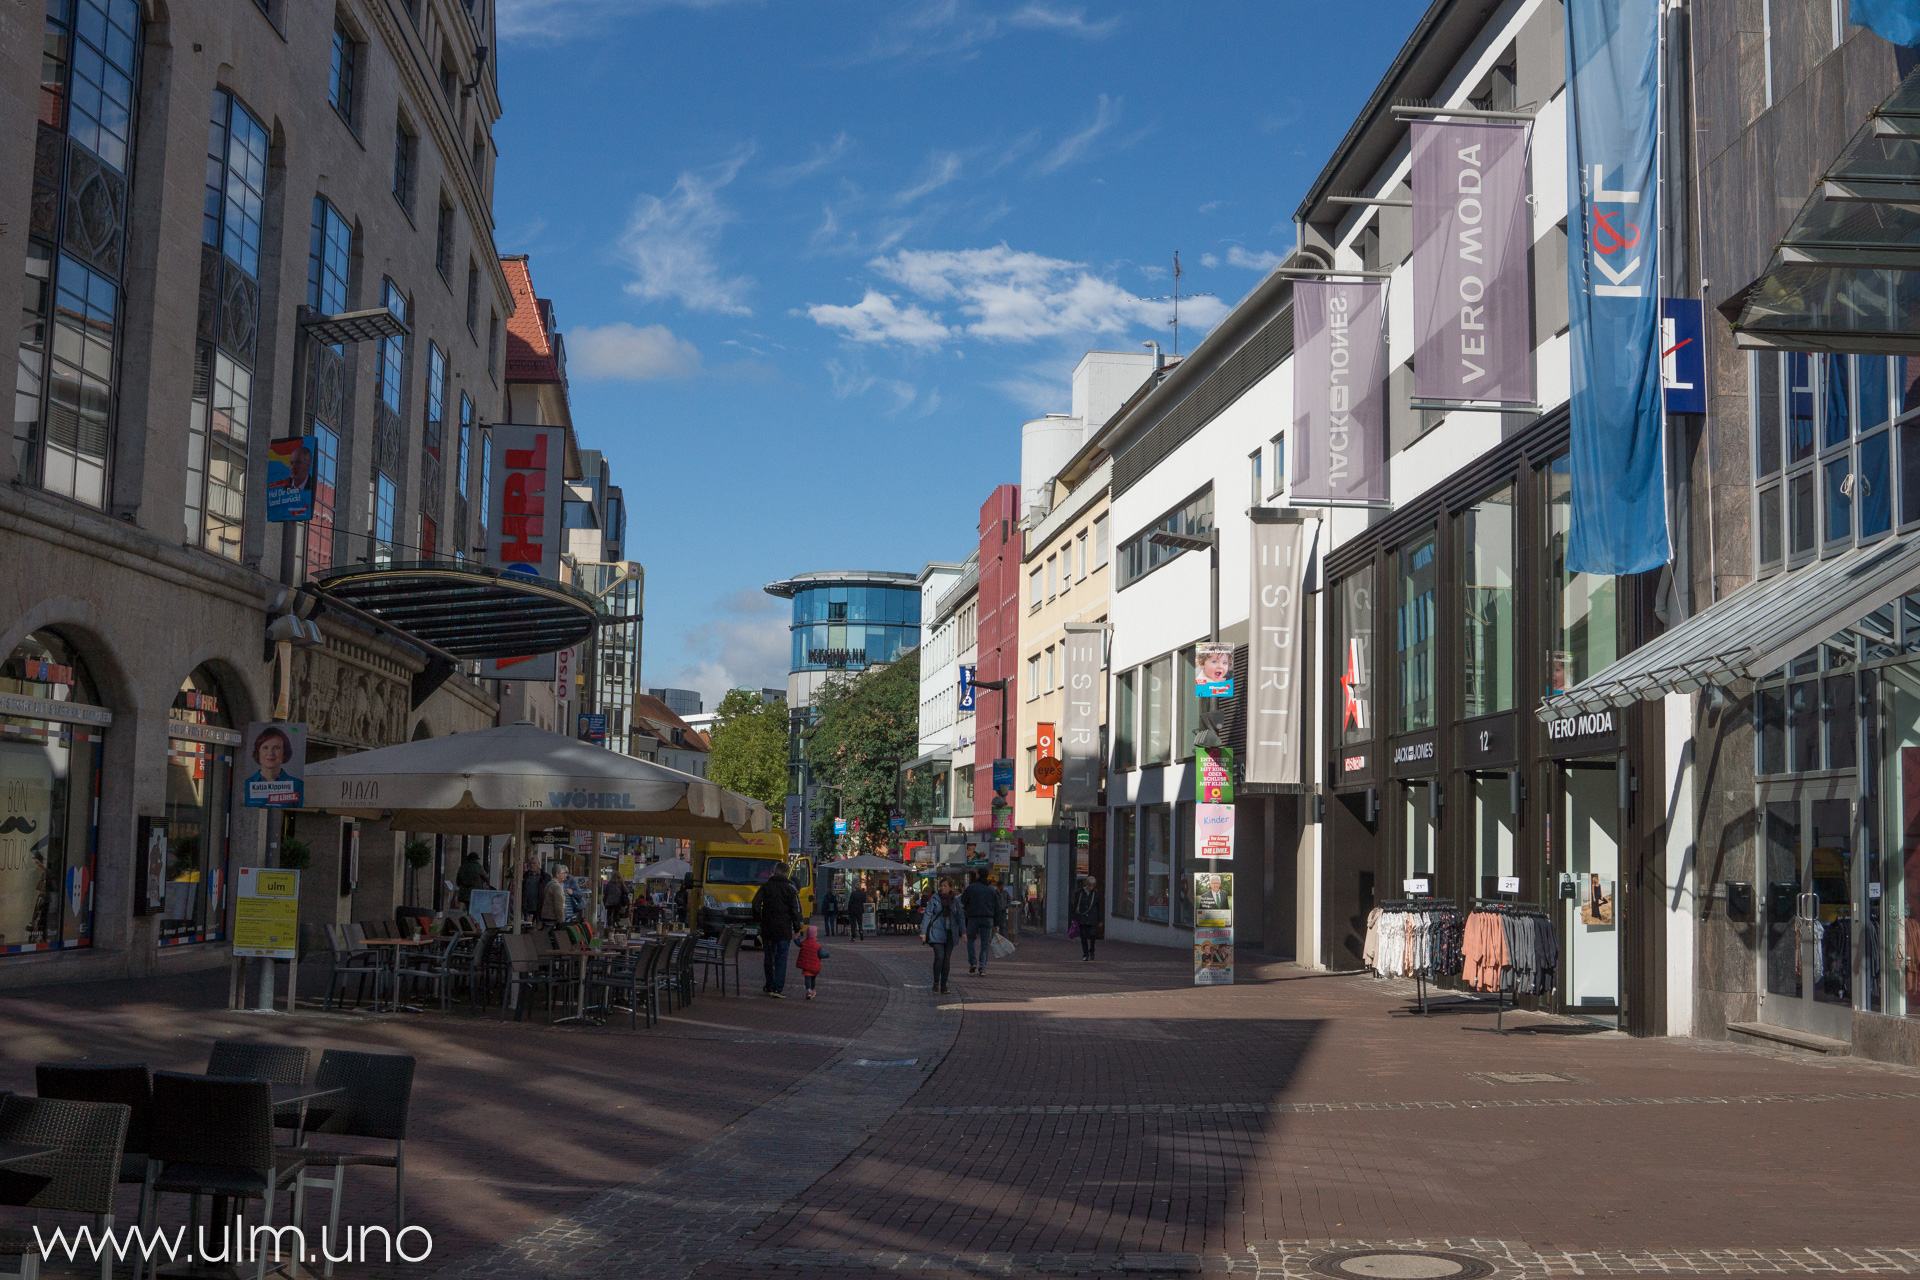 Ulm Shopping